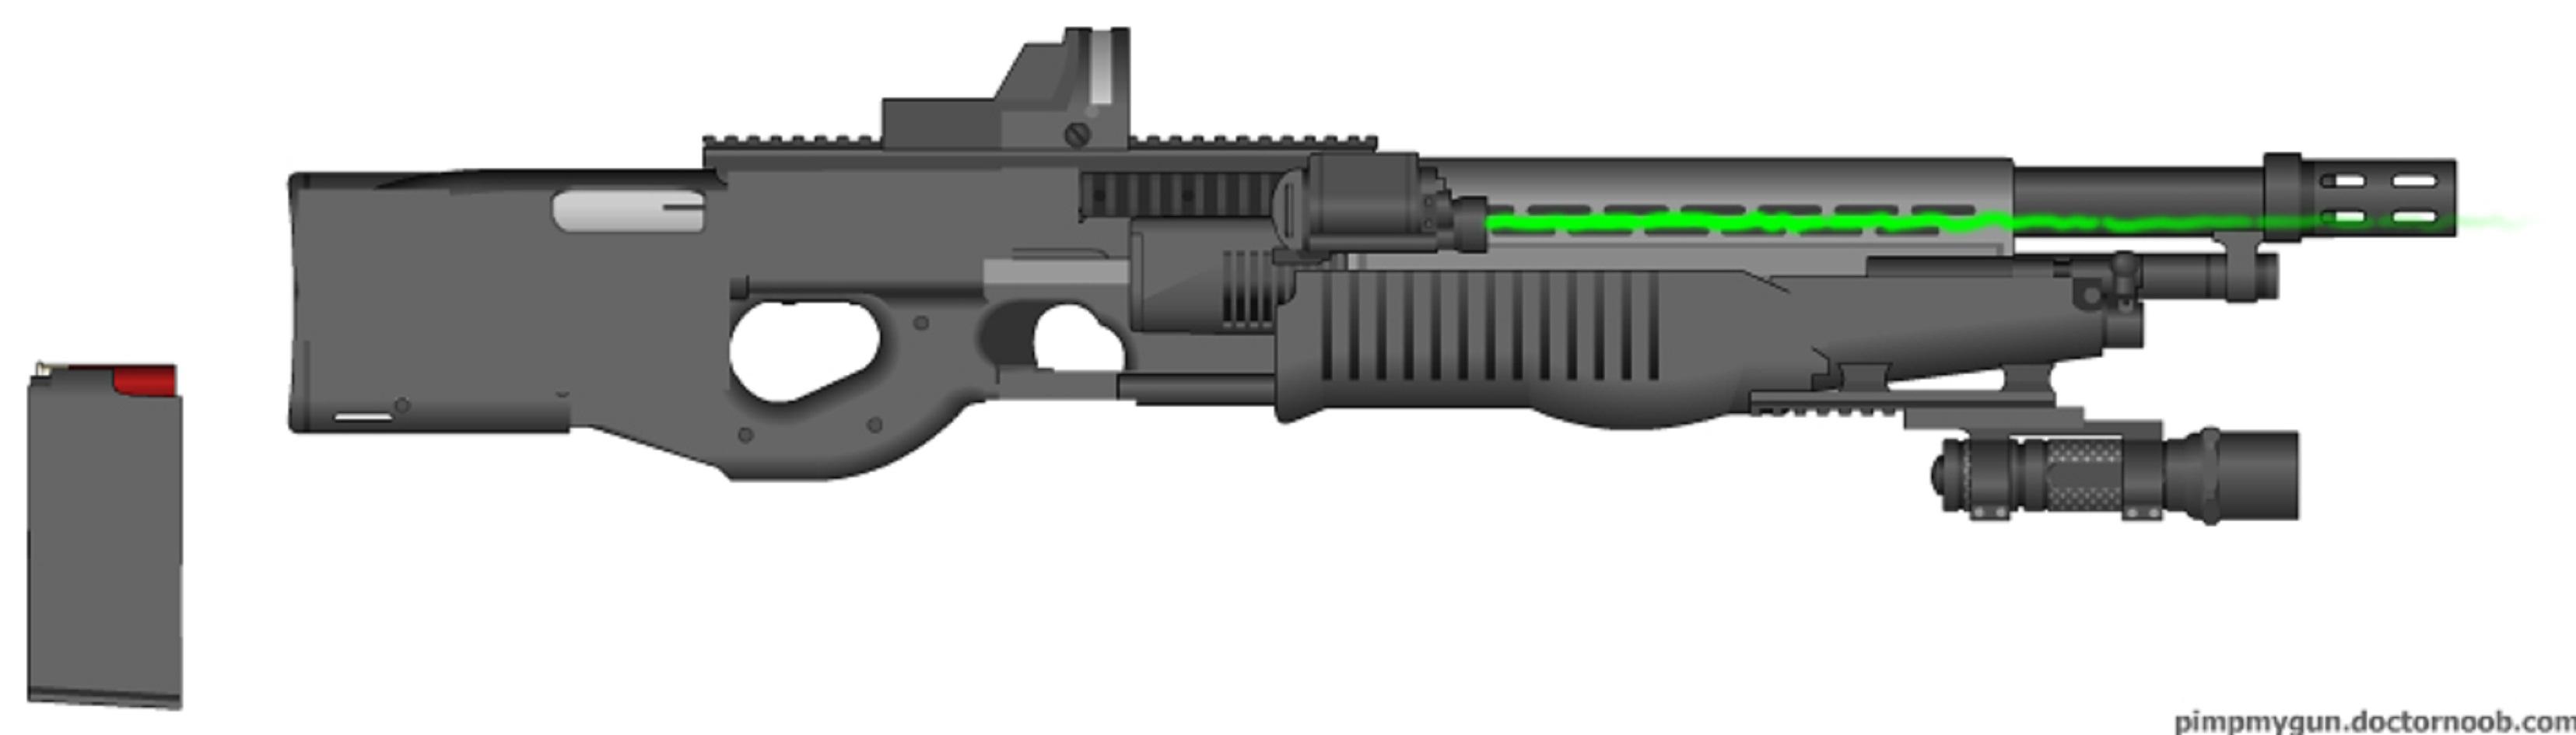 S70G Advanced Auto Shotgun by Marksman104